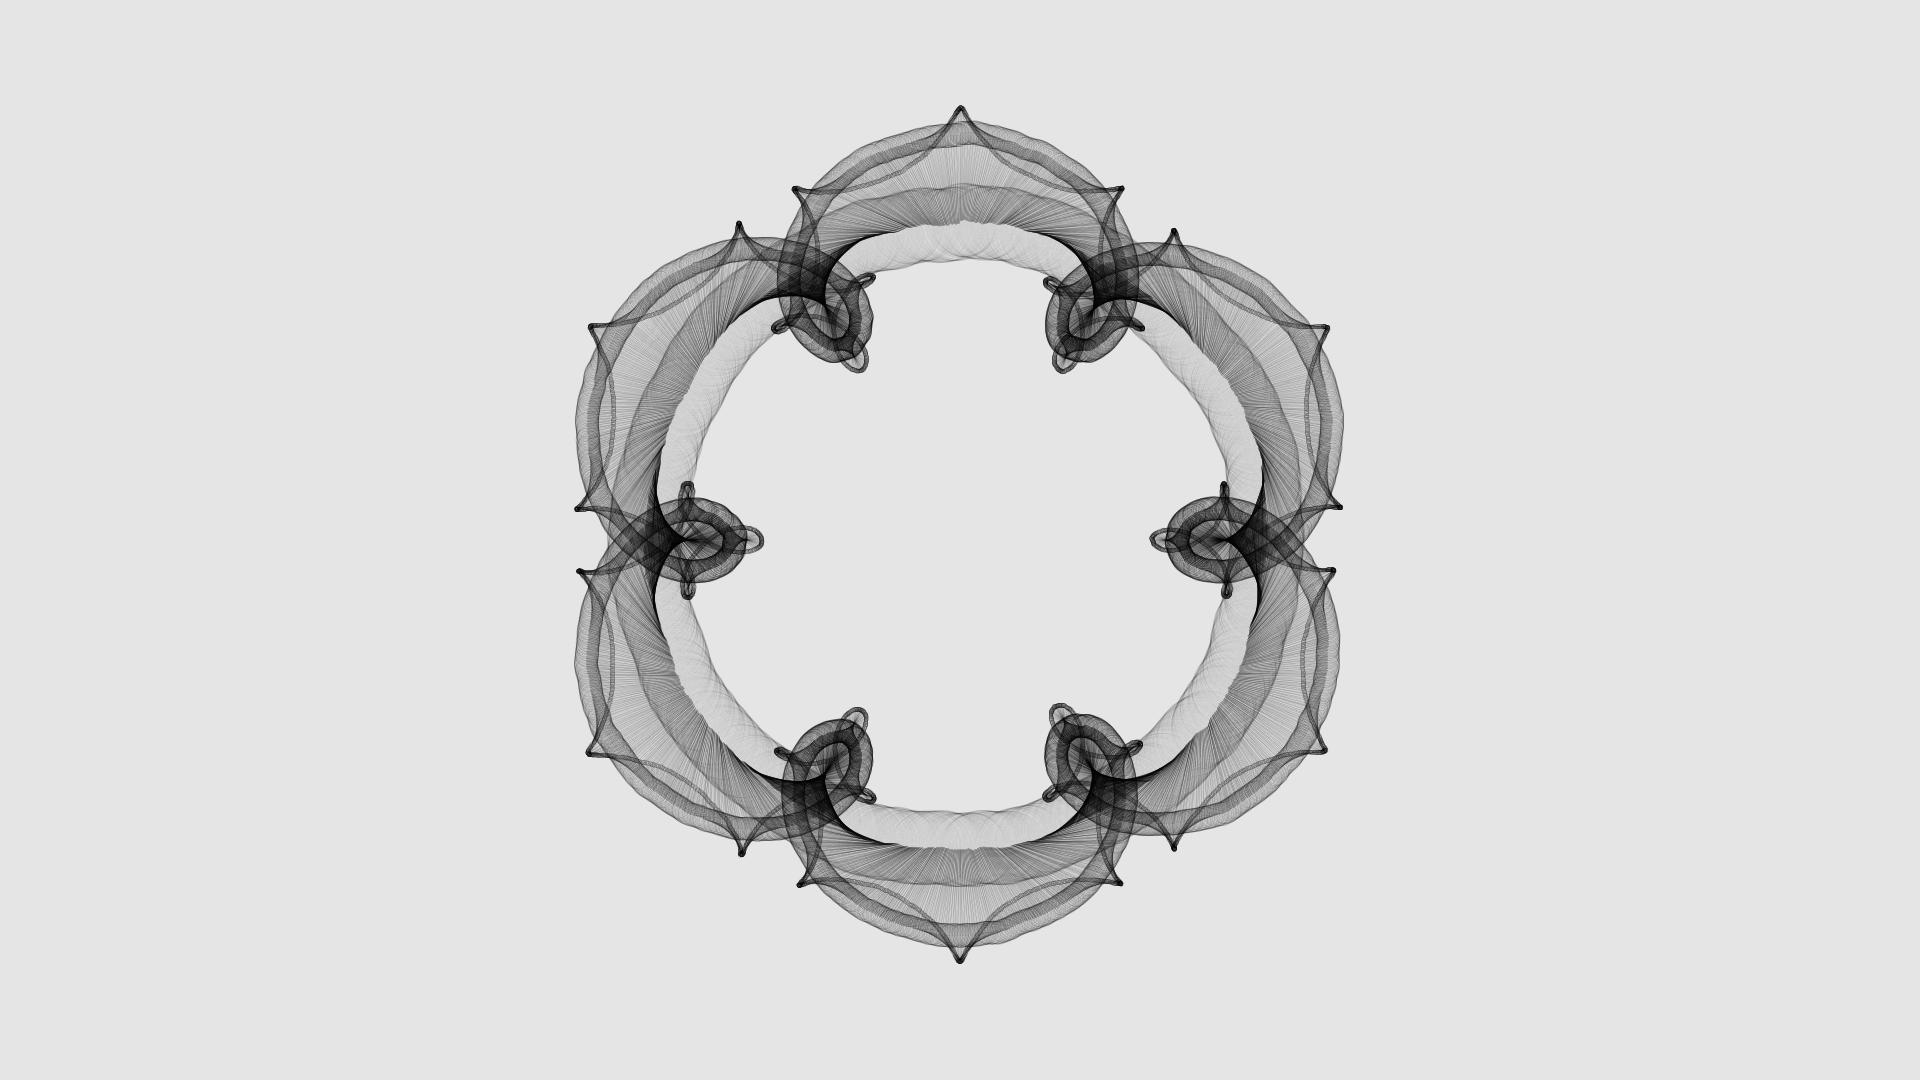 d2-L-C-E-MLR-m0.001-M6E6-F7884-1314-219-O316.89917-88.1535-26.29631-D73.0-23.0-4.0.png